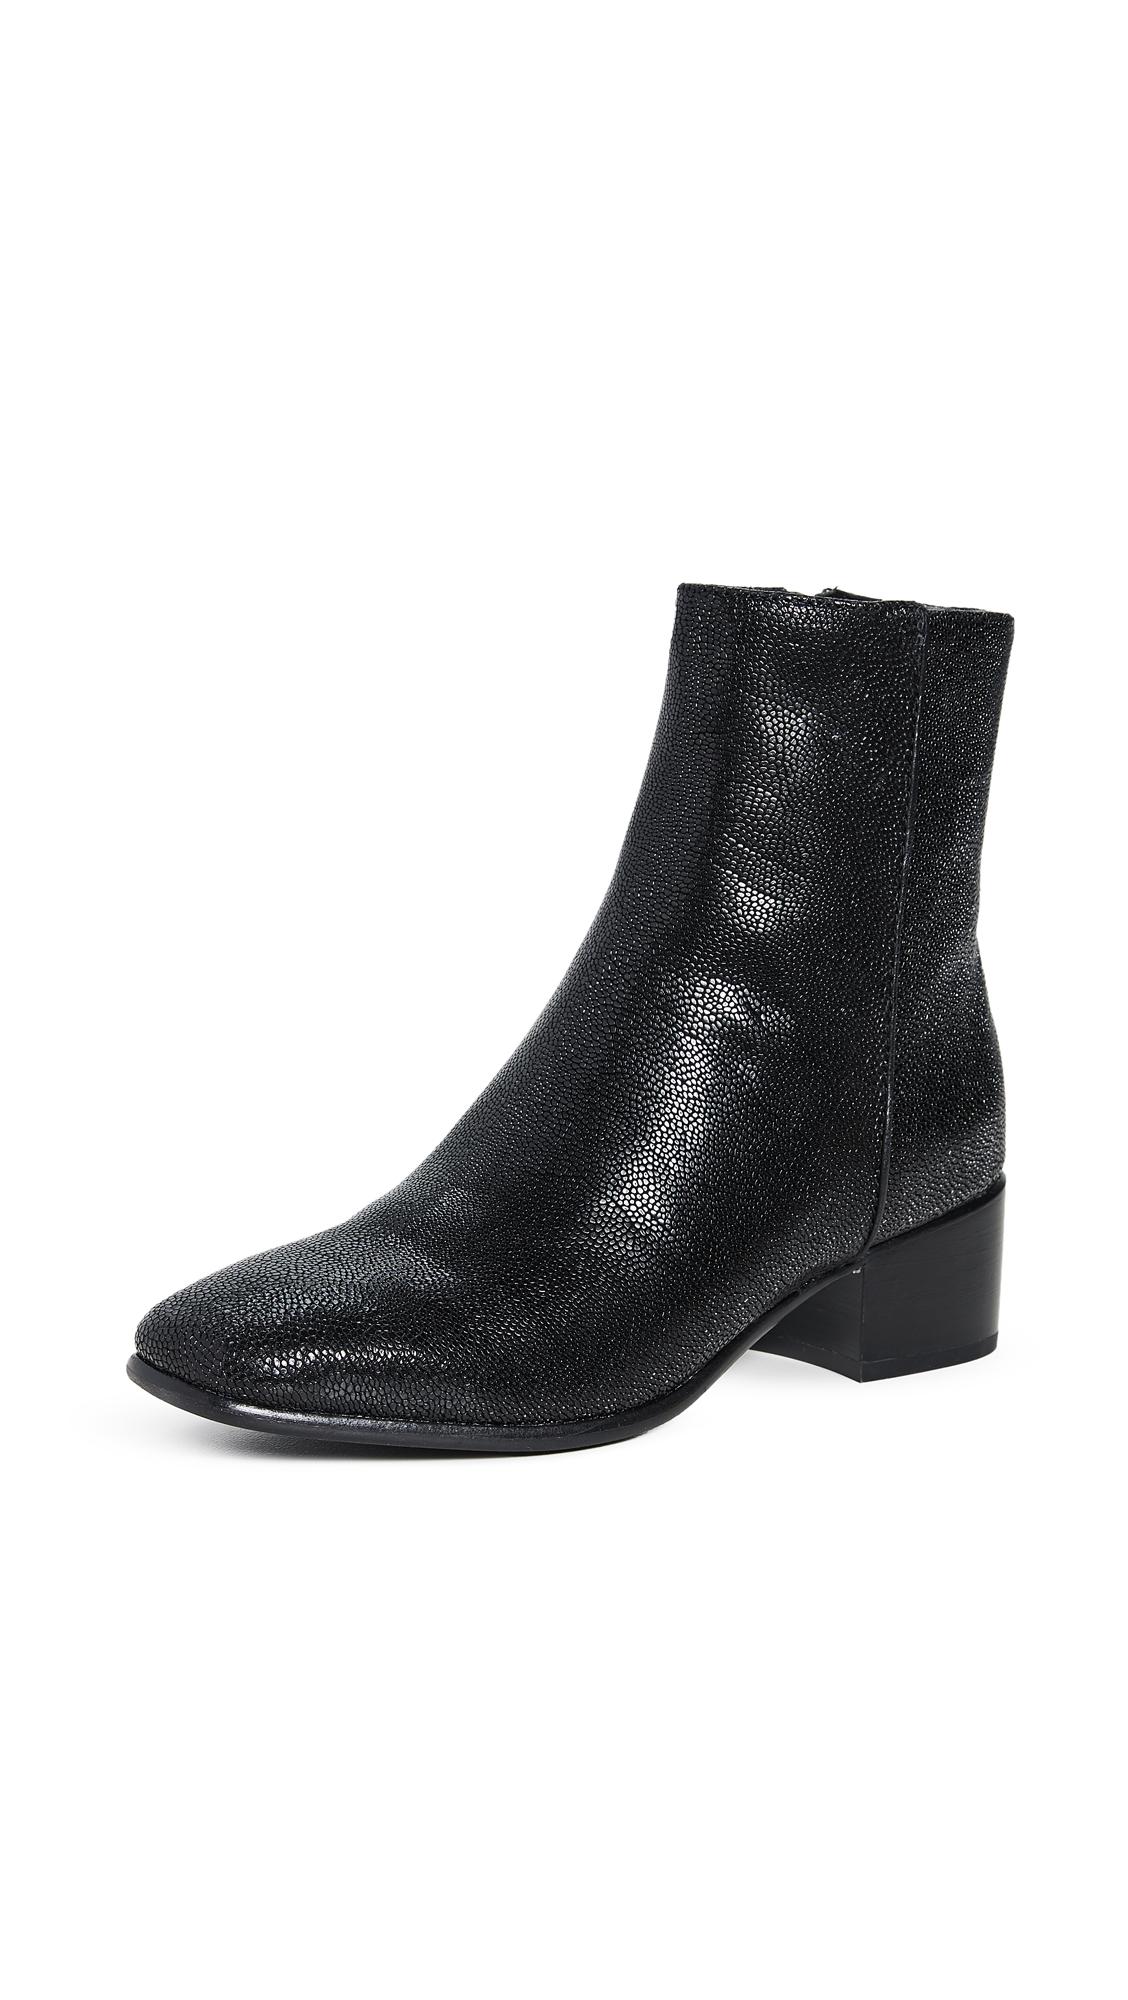 Rag & Bone Aslen Mid Boots – 50% Off Sale